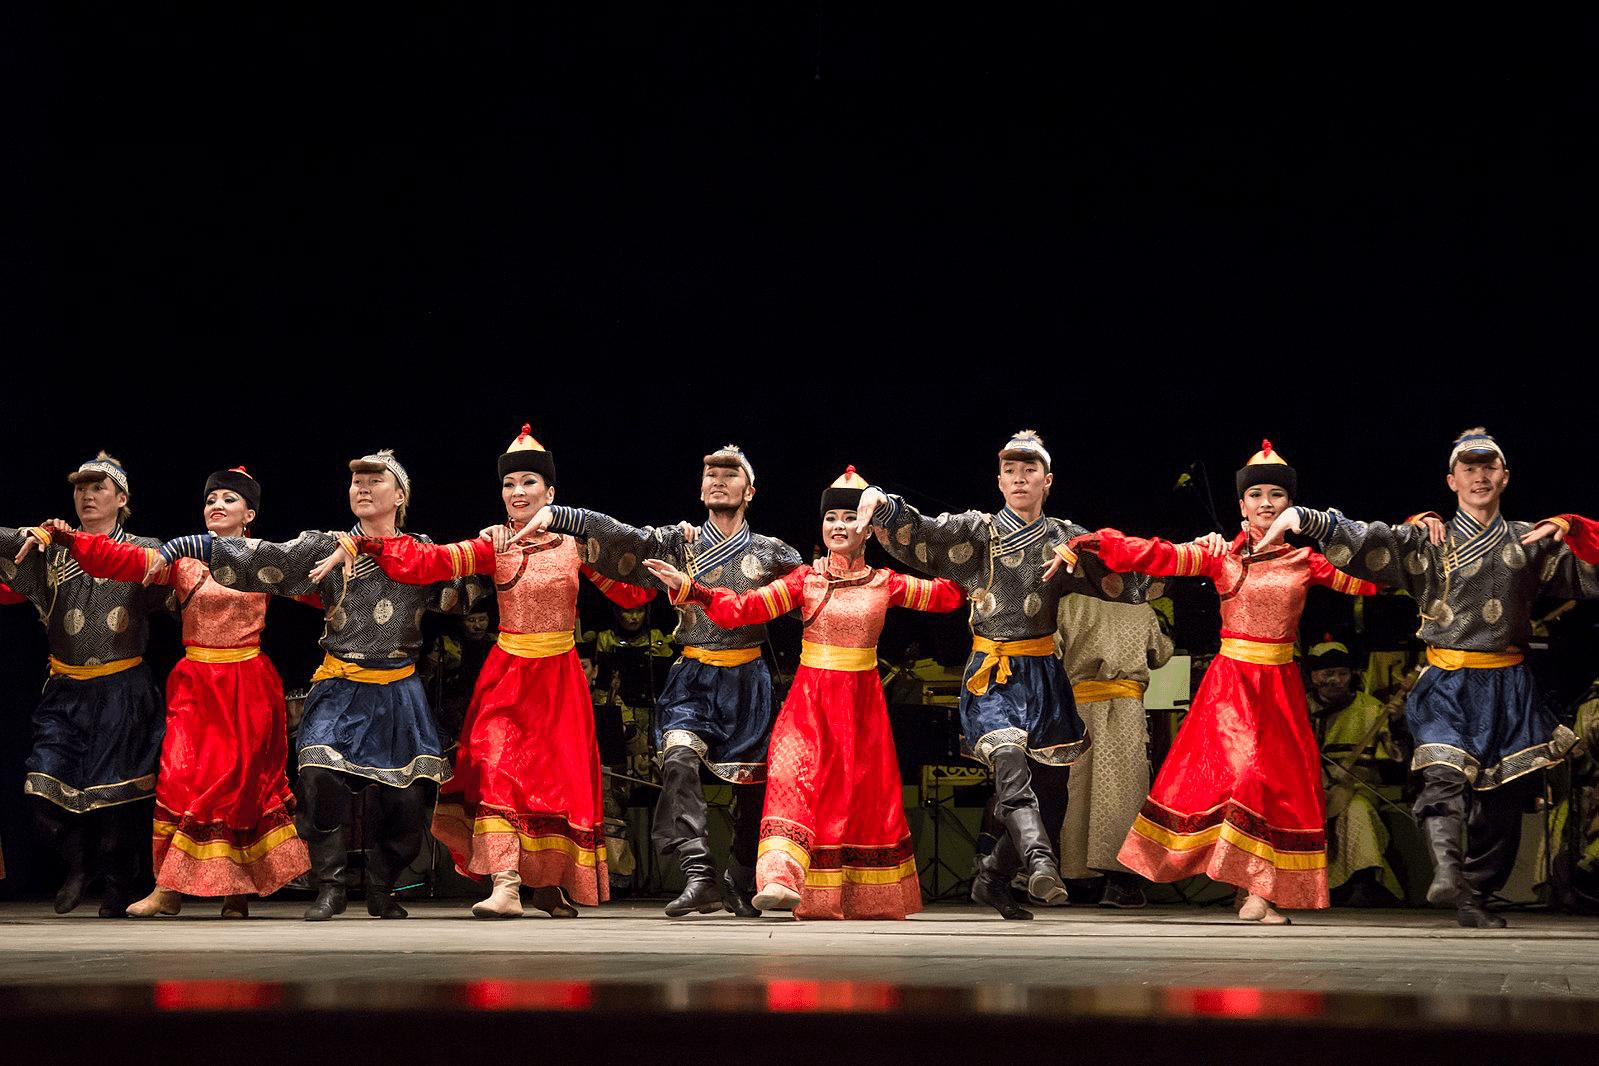 Siberian Folk Dance